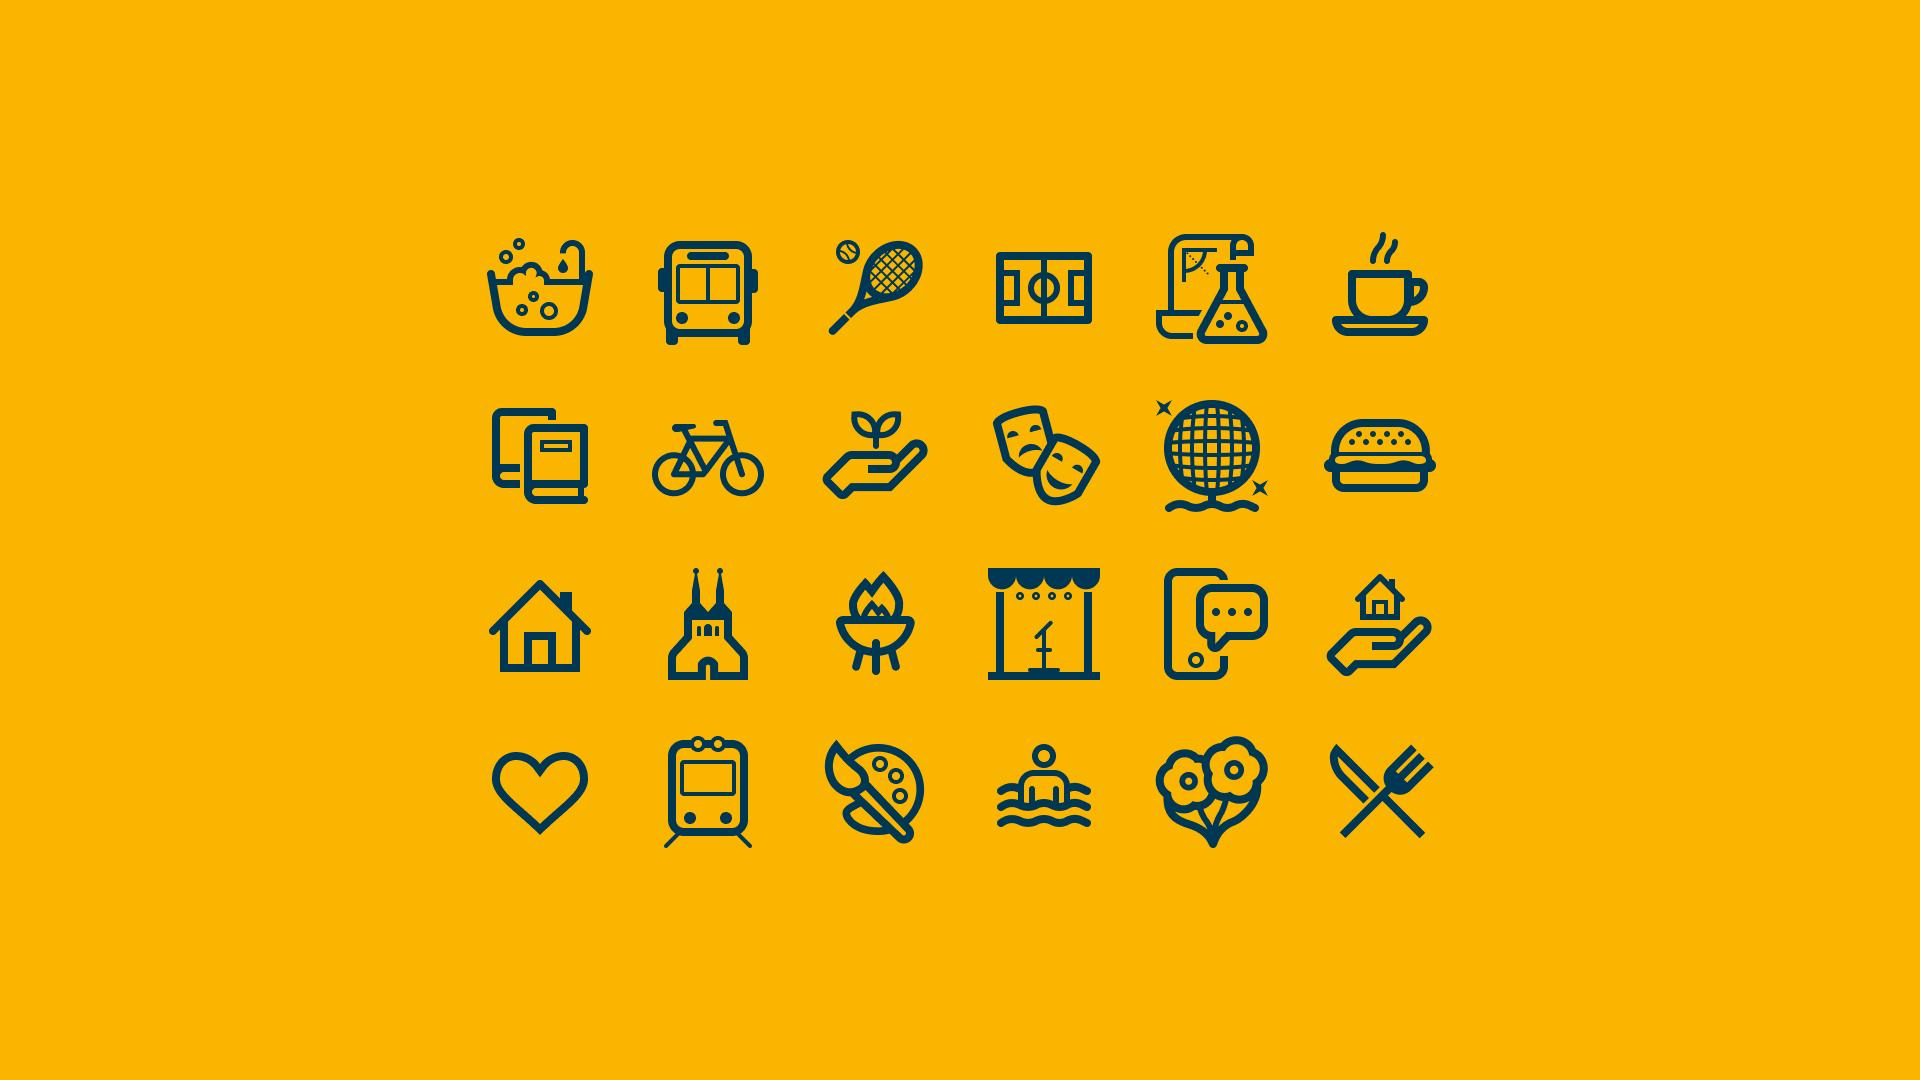 Växjö Kommun - pictogram